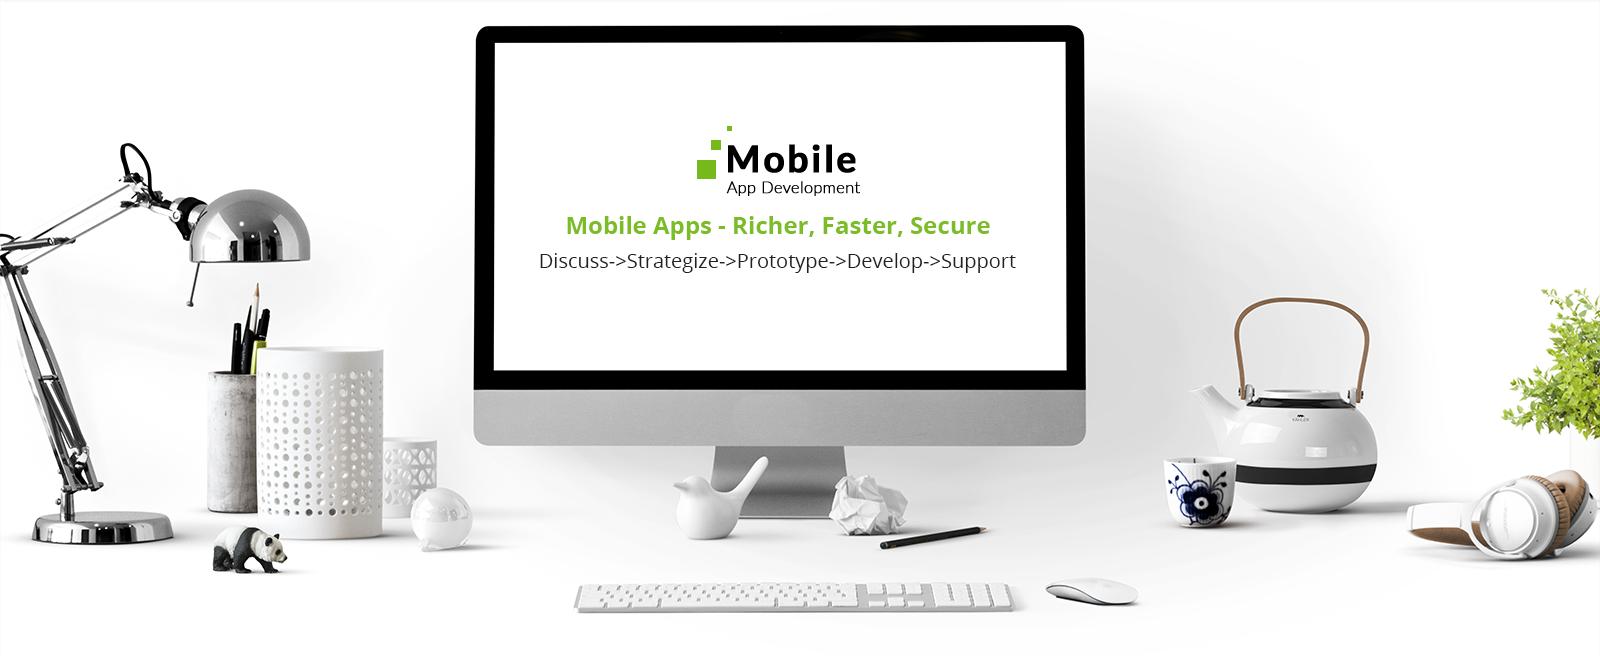 home-slider-tekzee-technologies-indore-mobile-app-development